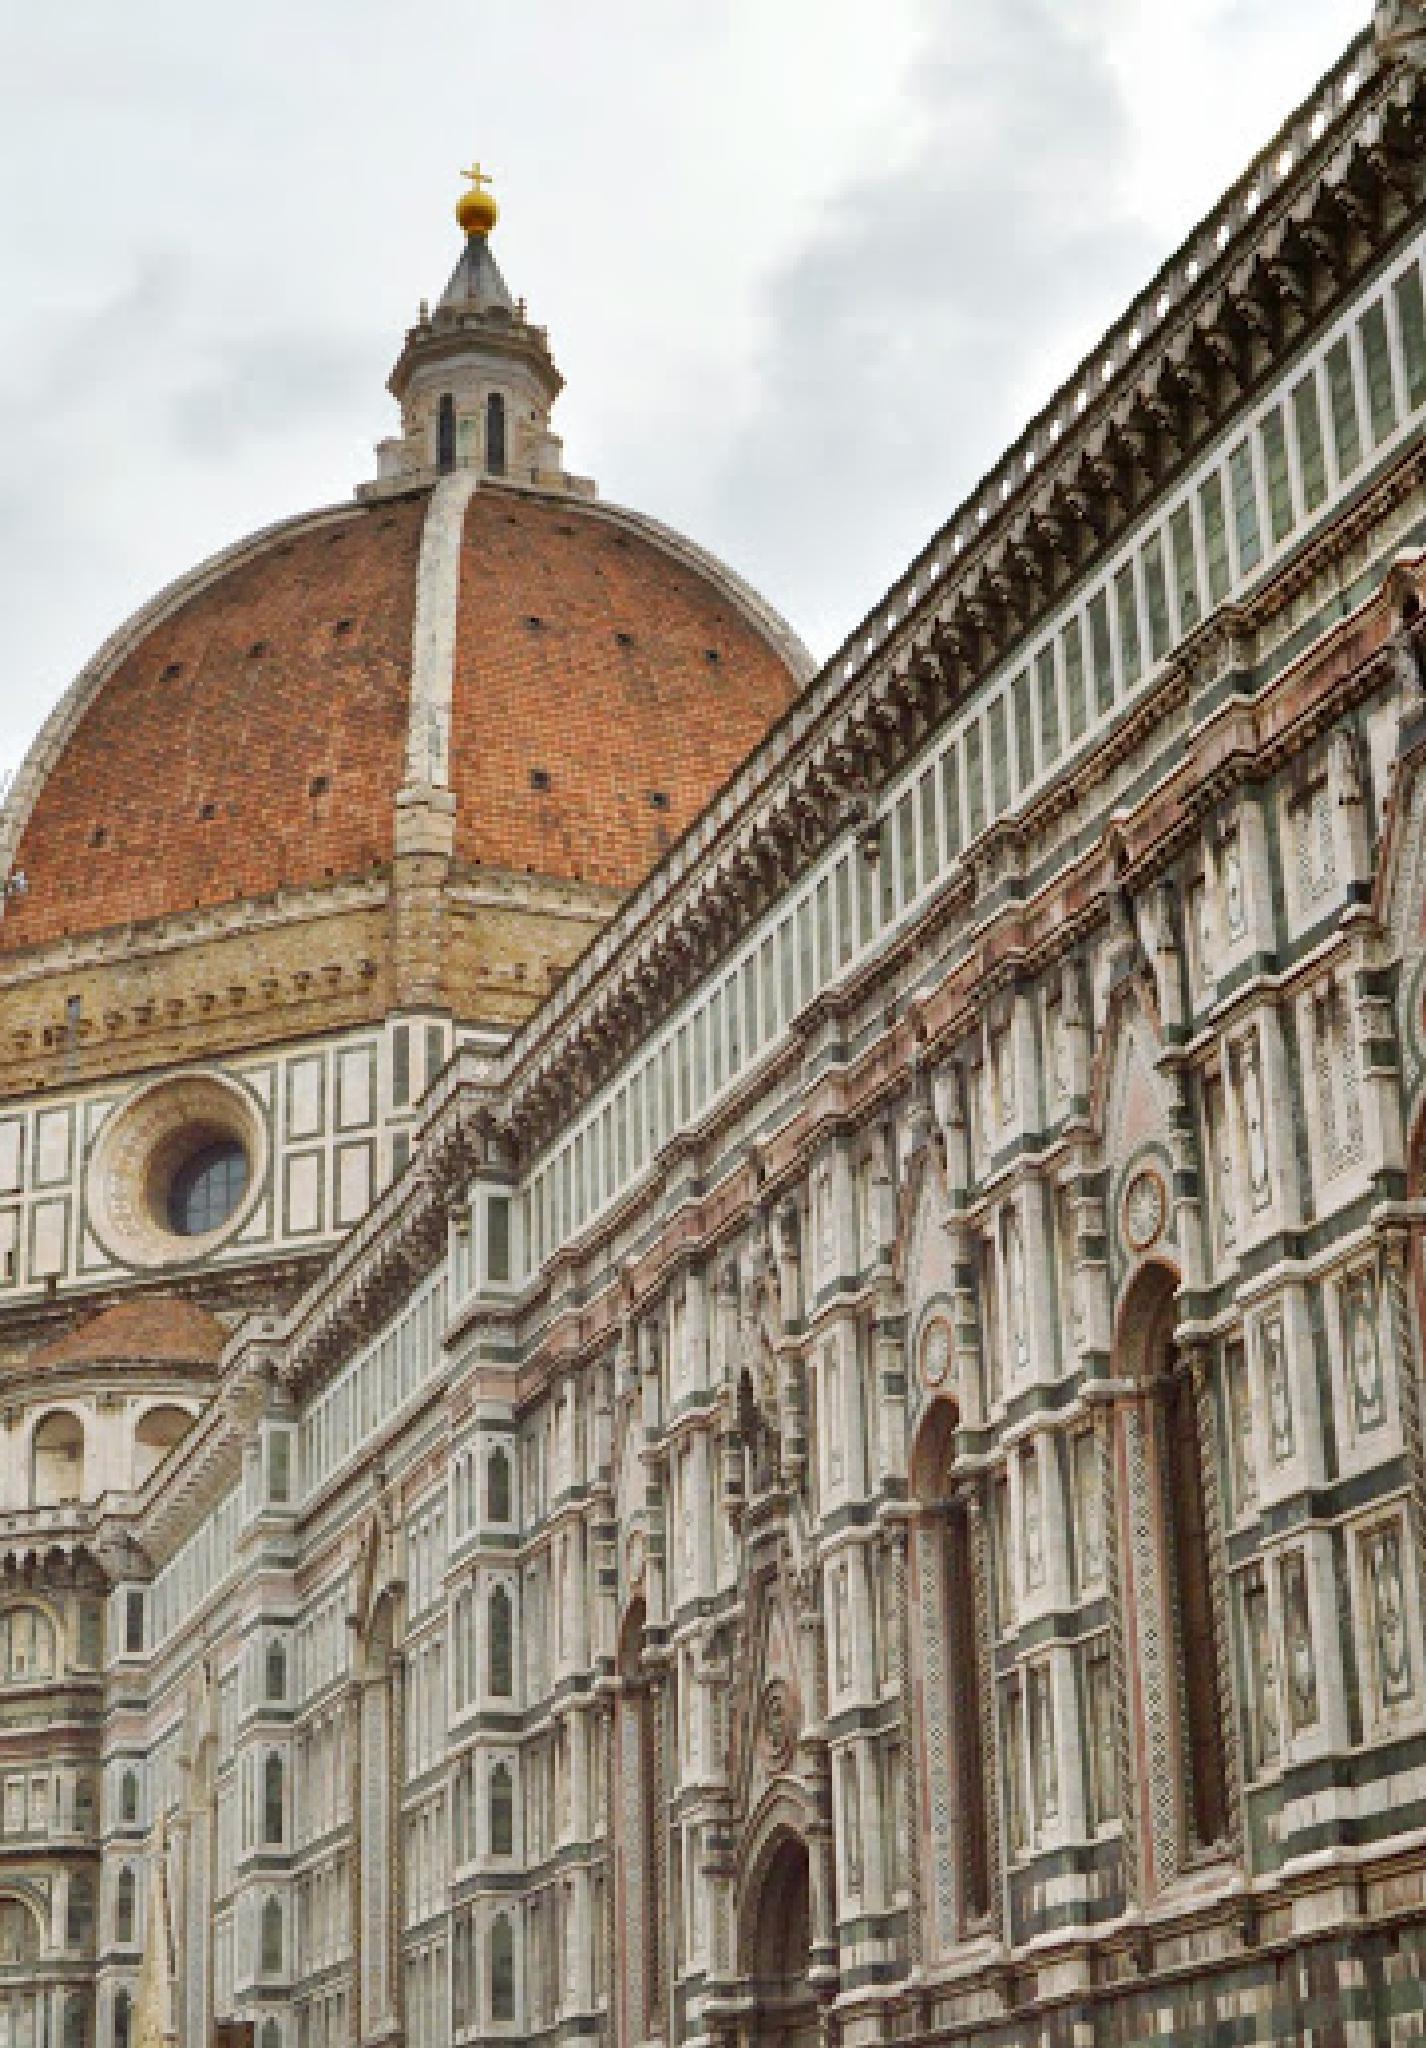 Firenze by Ann Kristin